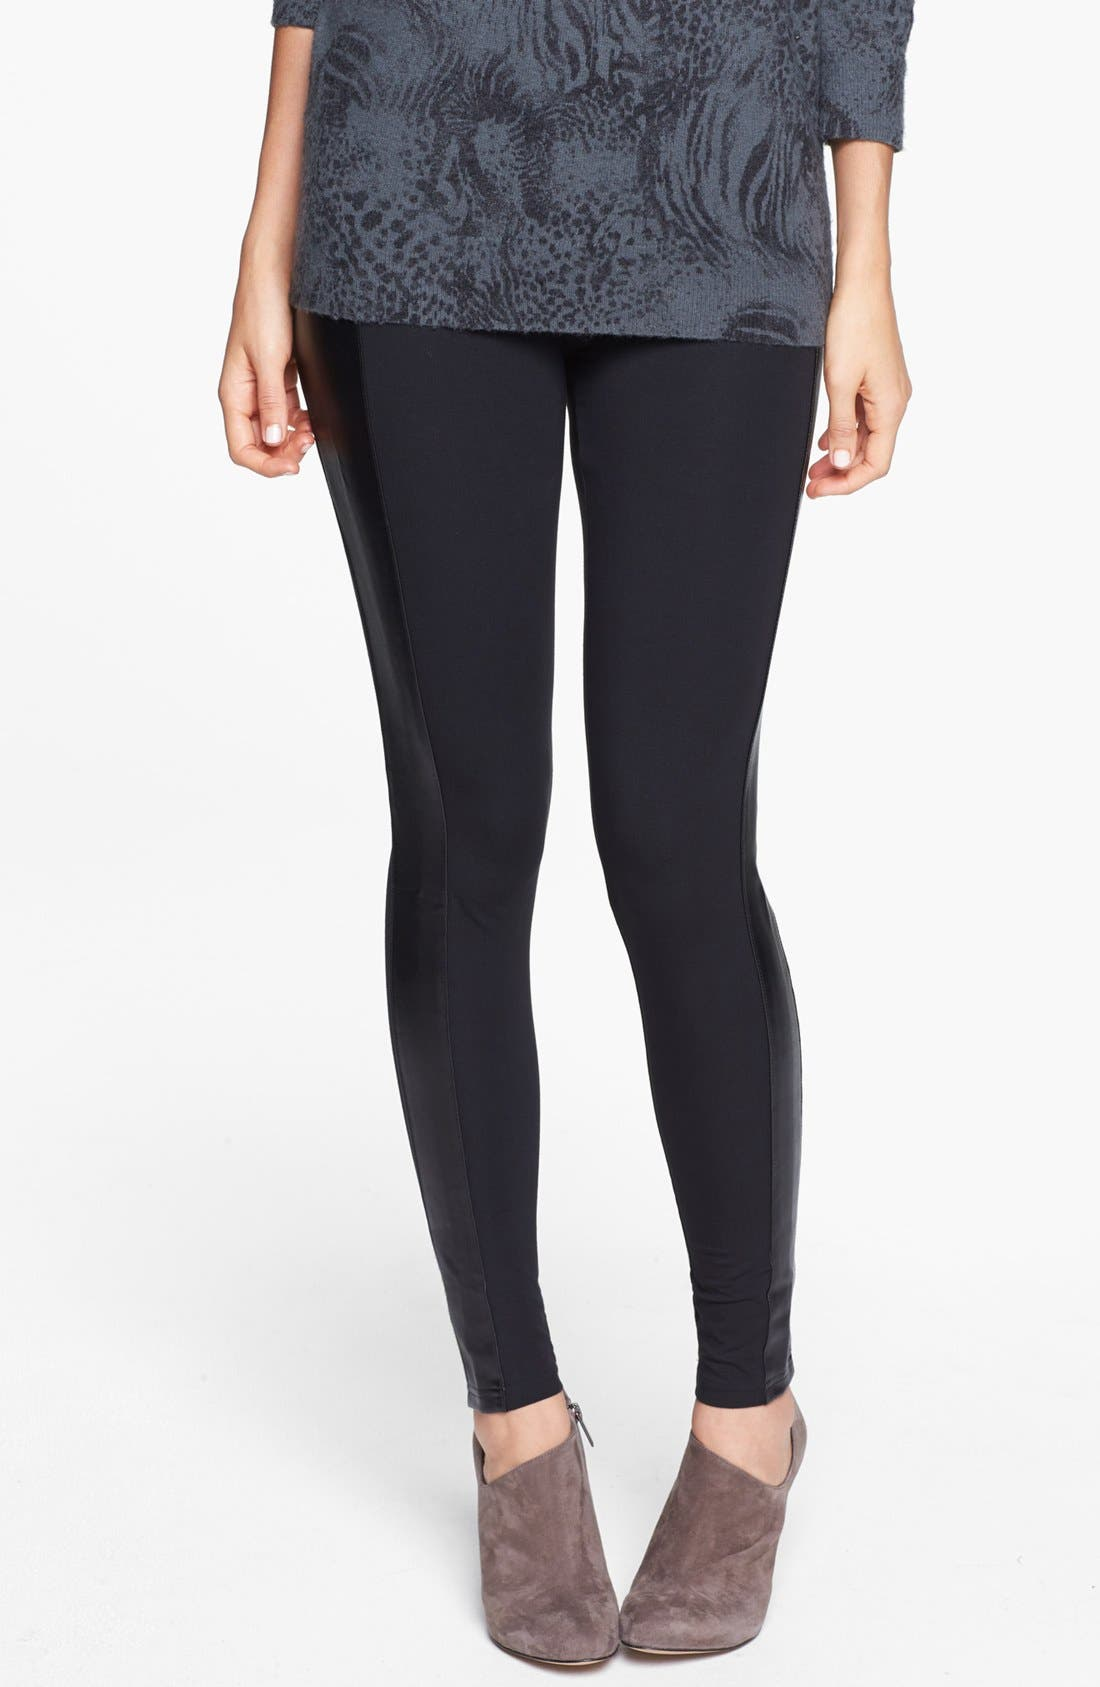 Alternate Image 2  - Frenchi® Faux Leather Trim Leggings (Juniors)